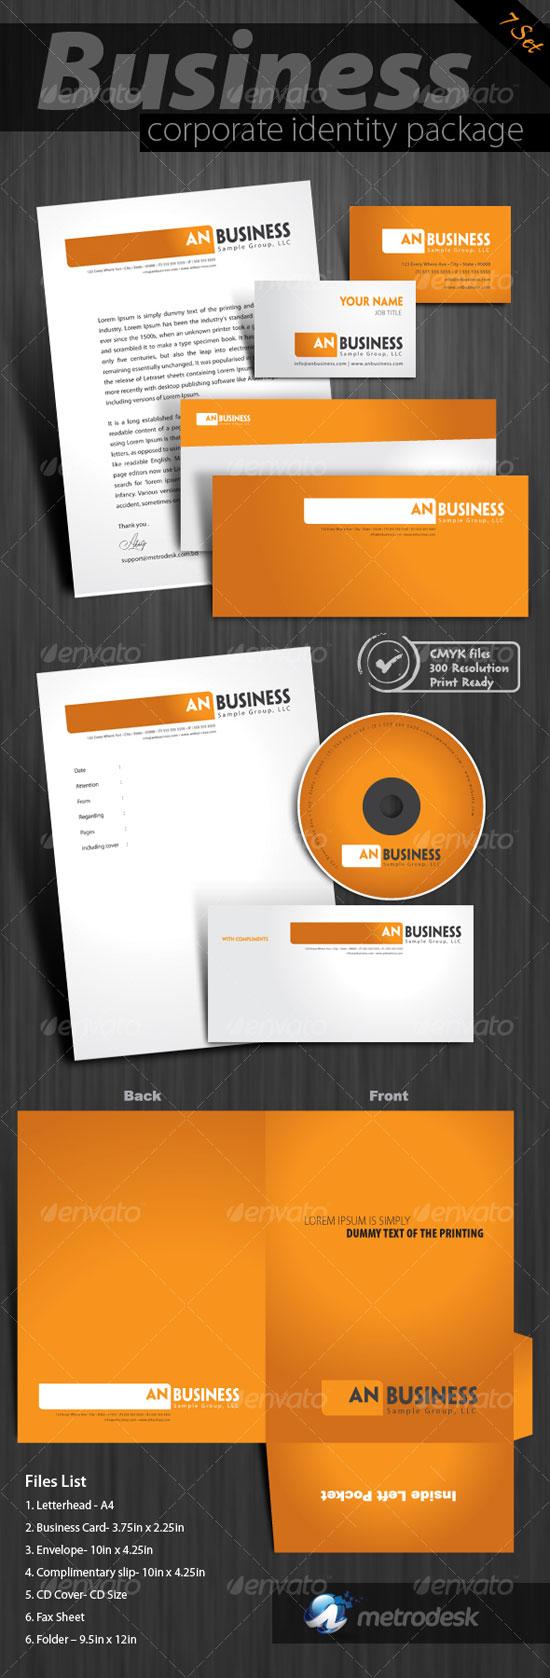 creative corporate identity design templates